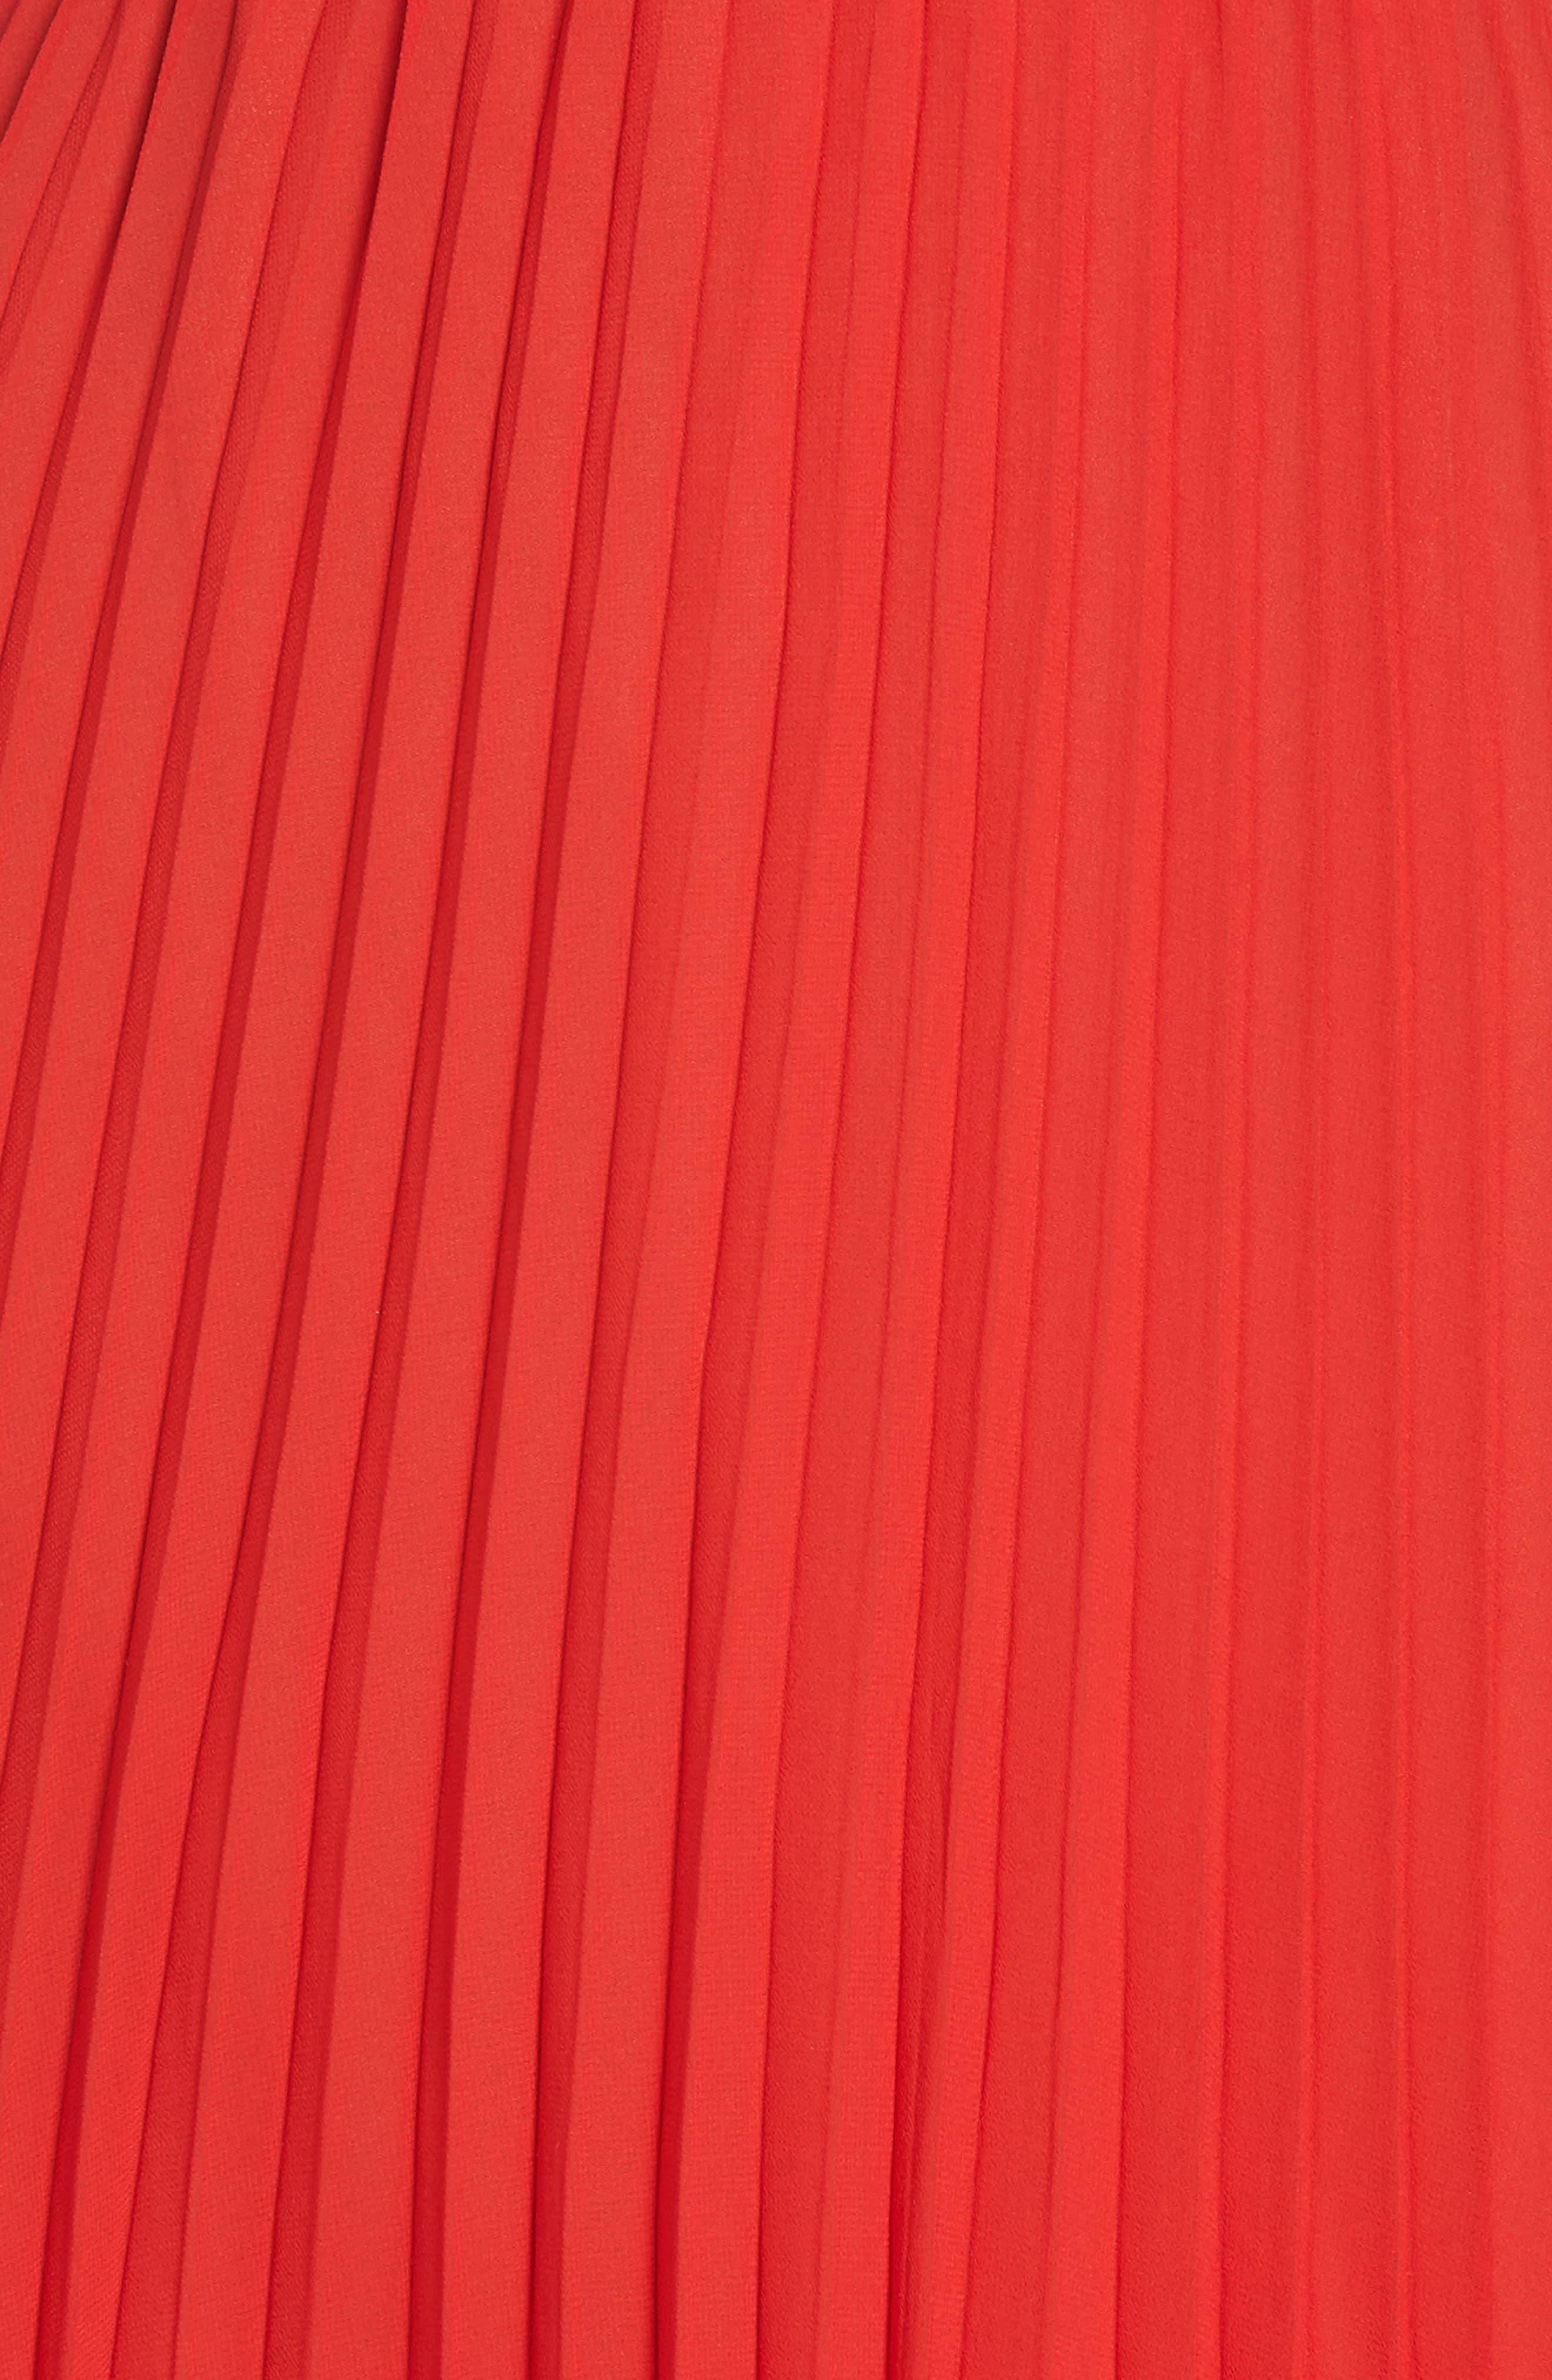 Nealea Pleated Sheath Dress,                             Alternate thumbnail 7, color,                             Red